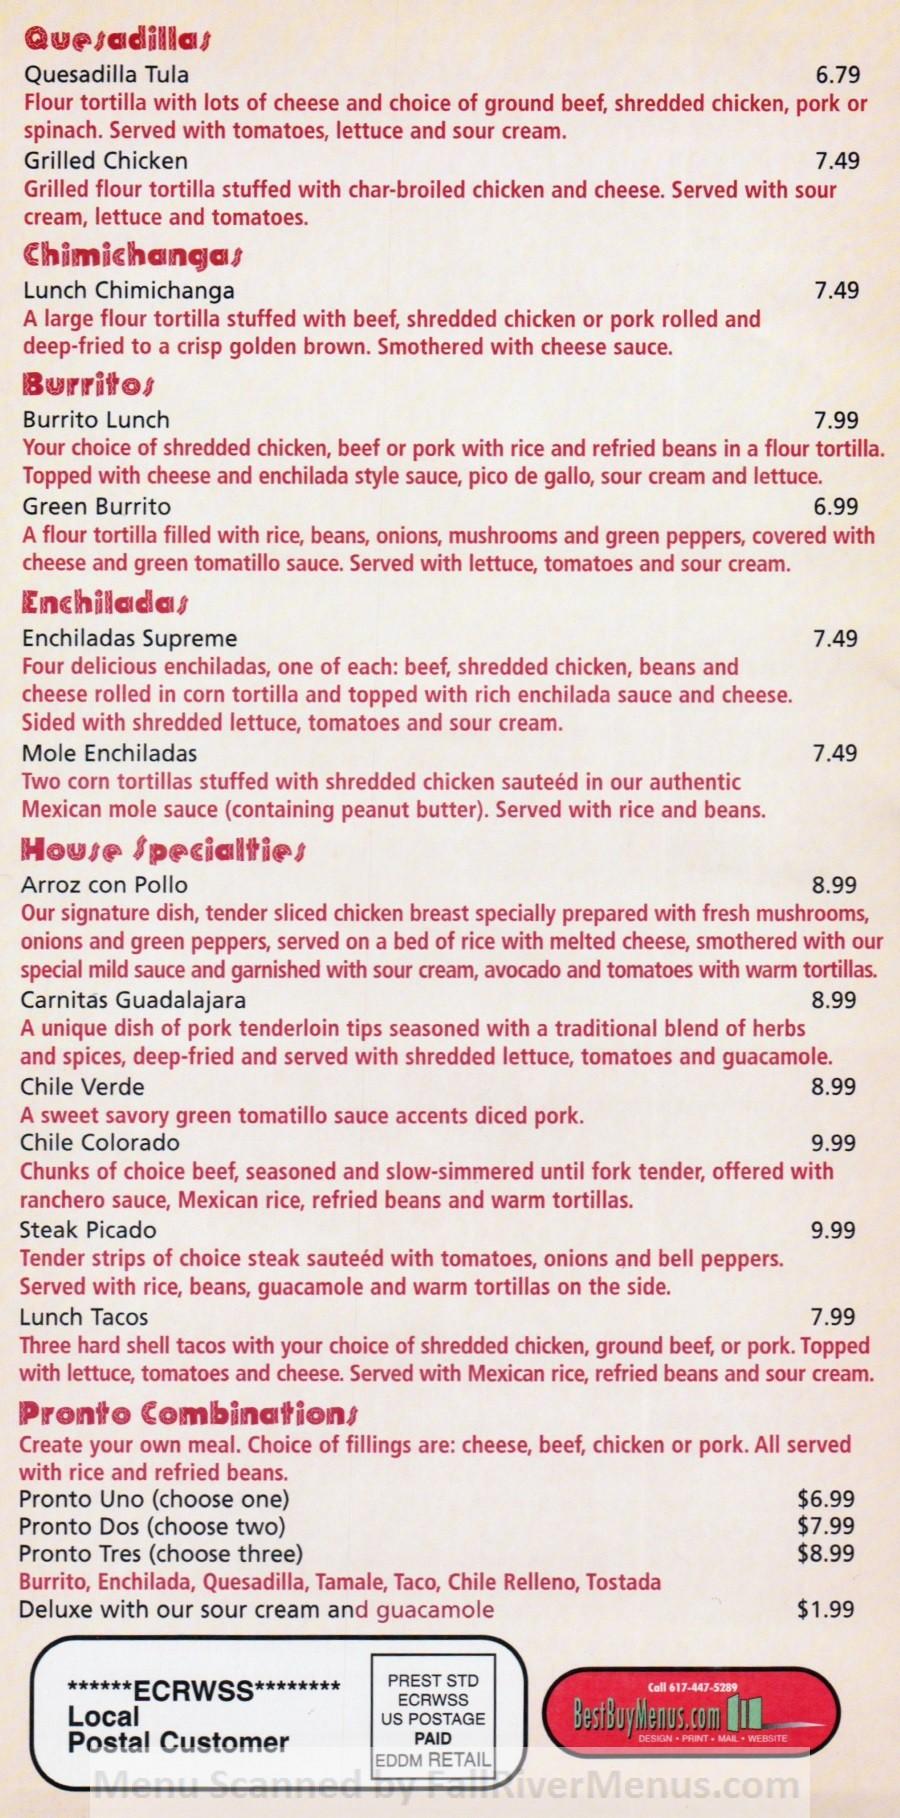 fiesta mexican restaurant menu 6 scnd 4-19-2016